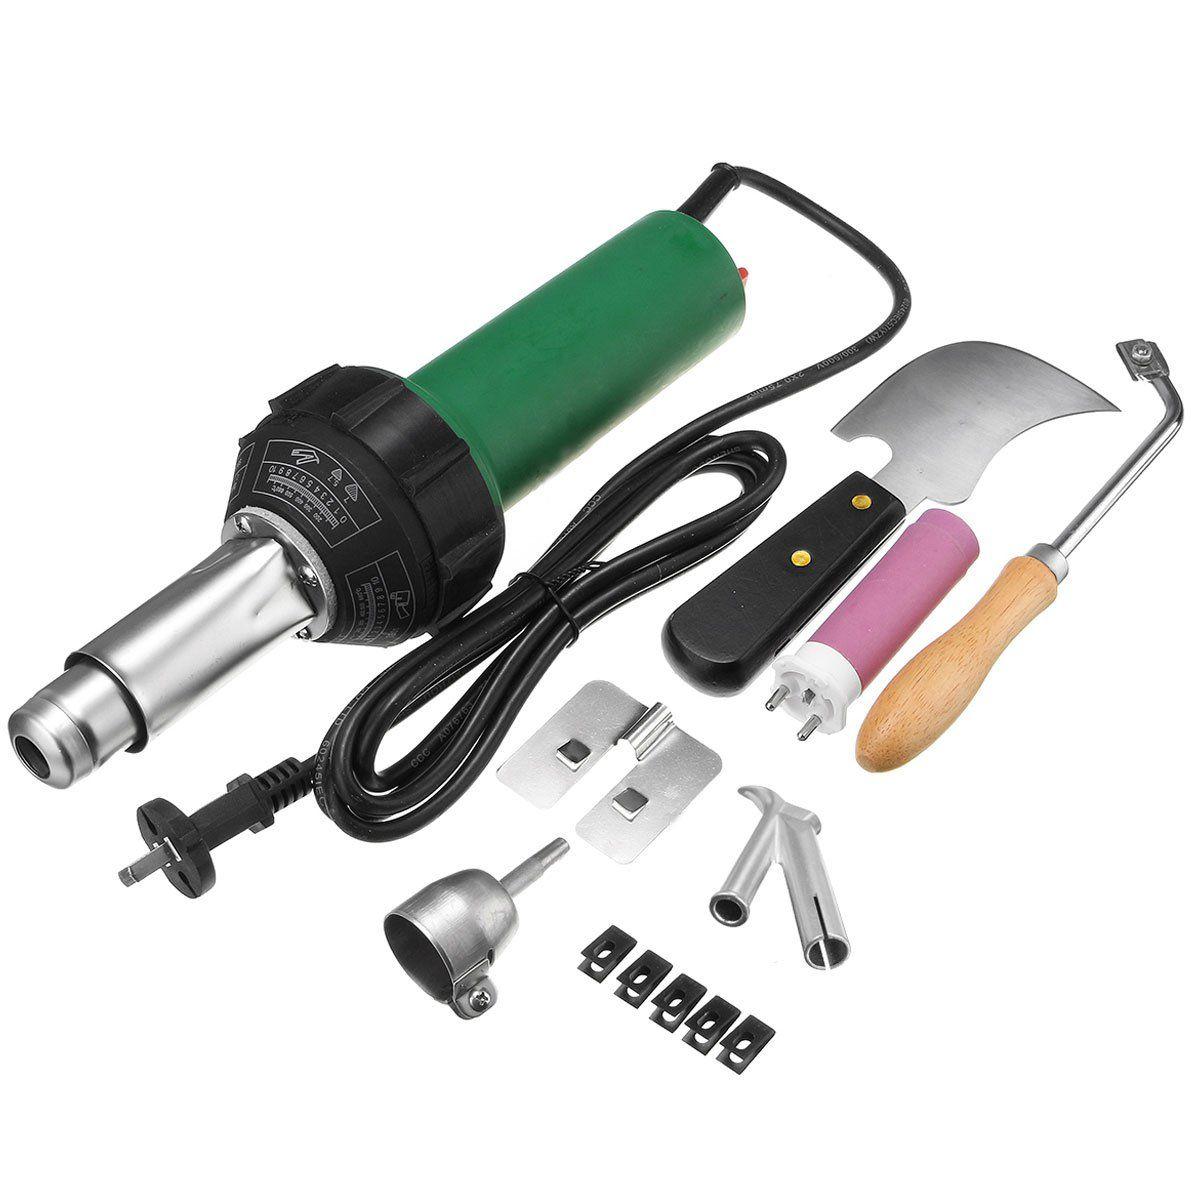 JIGUOOR 220V 1500W Heat Gun Plastic PVC Floor Welding Torch Hot Air Blower With Accessories